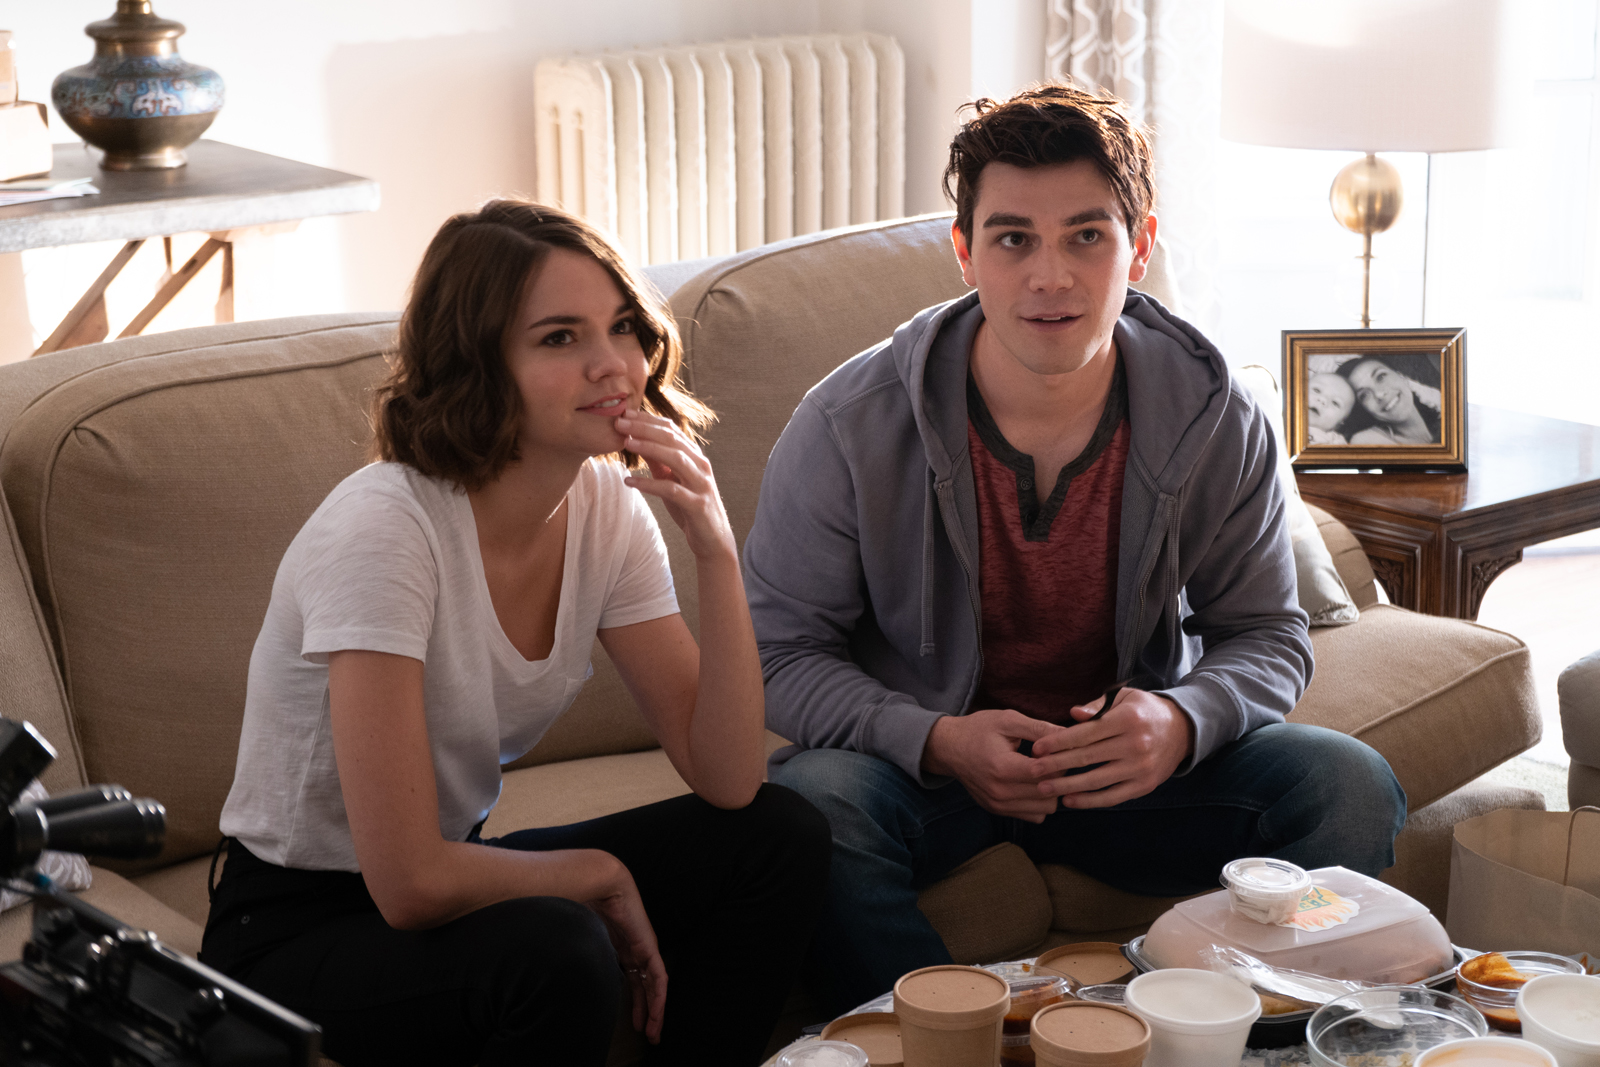 Netflixs The Last Summer stars KJ Apa and Maia Mitchell